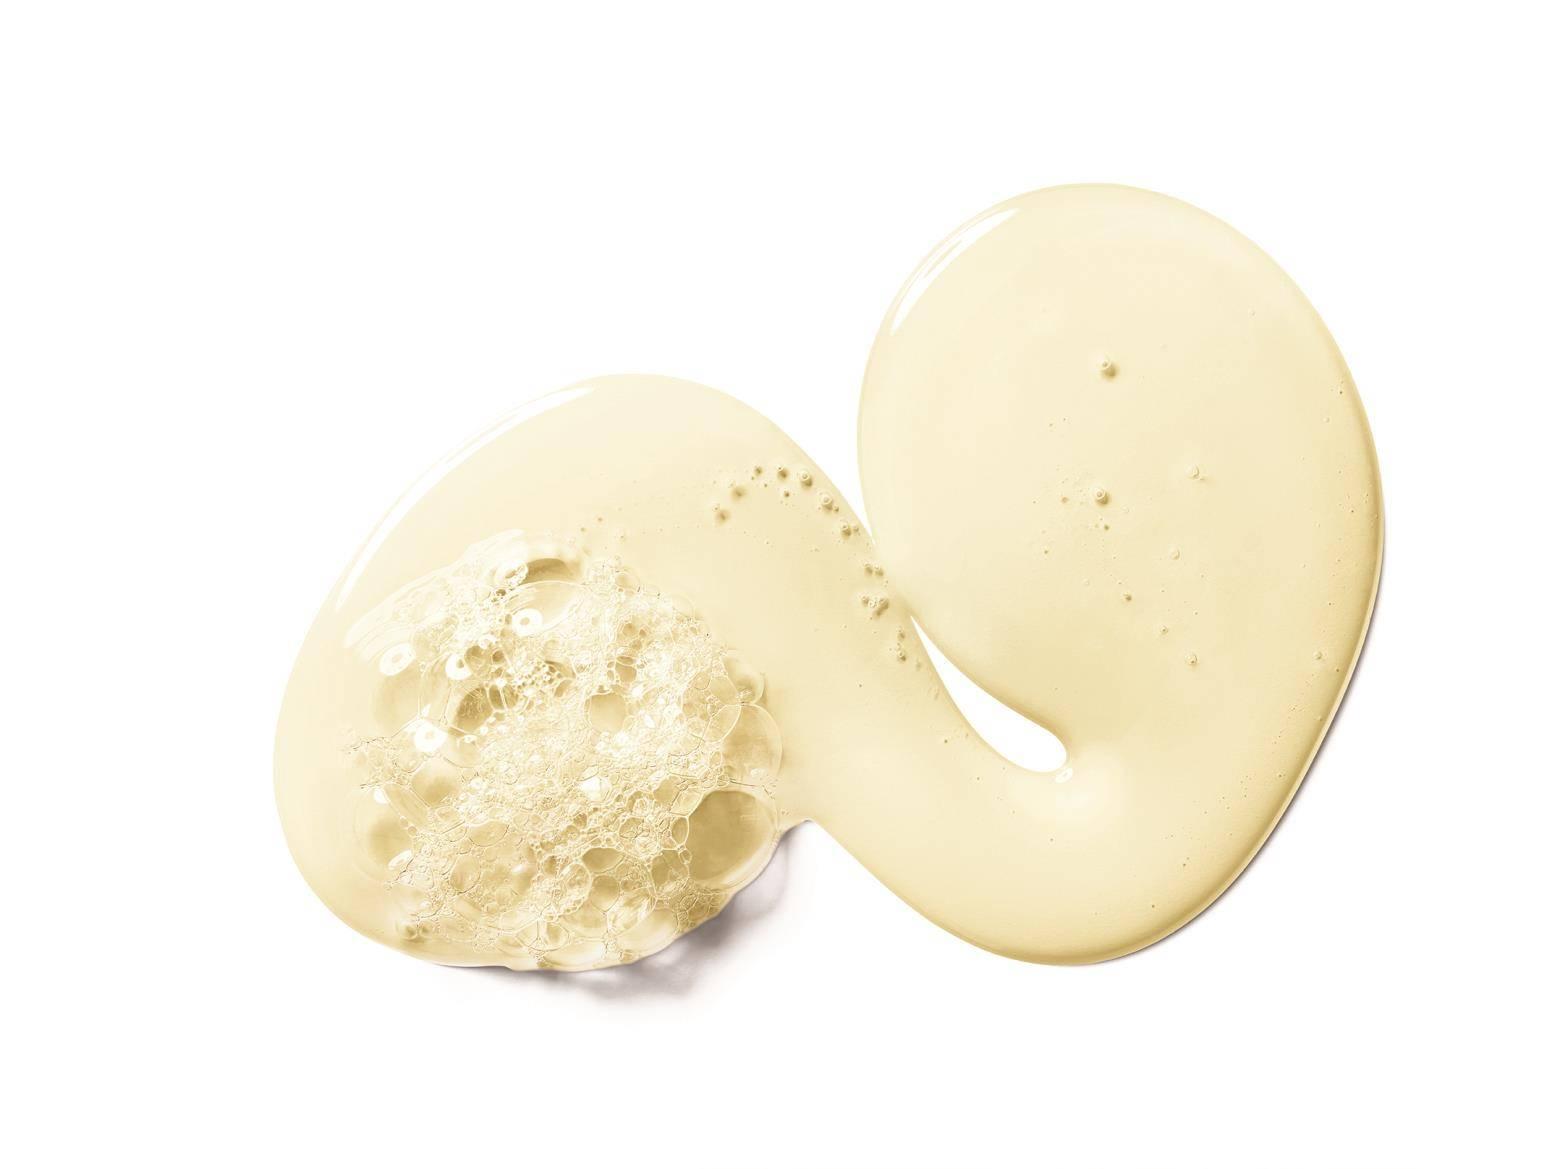 Larocheposay ProductPage Eczema Lipikar Huile Lavante Texture